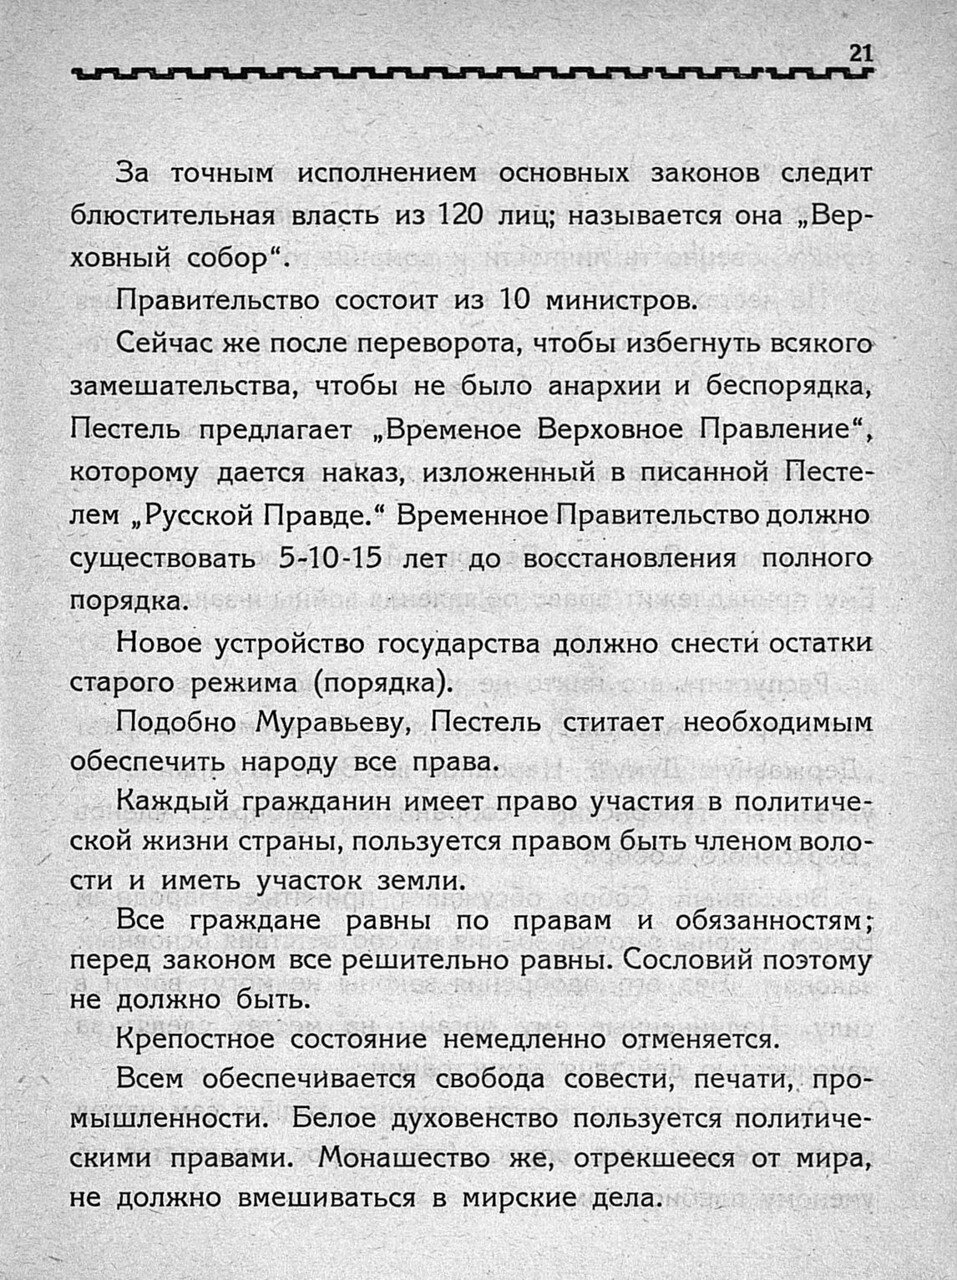 https://img-fotki.yandex.ru/get/35989/199368979.23/0_1bfad9_8a2f706f_XXXL.jpg